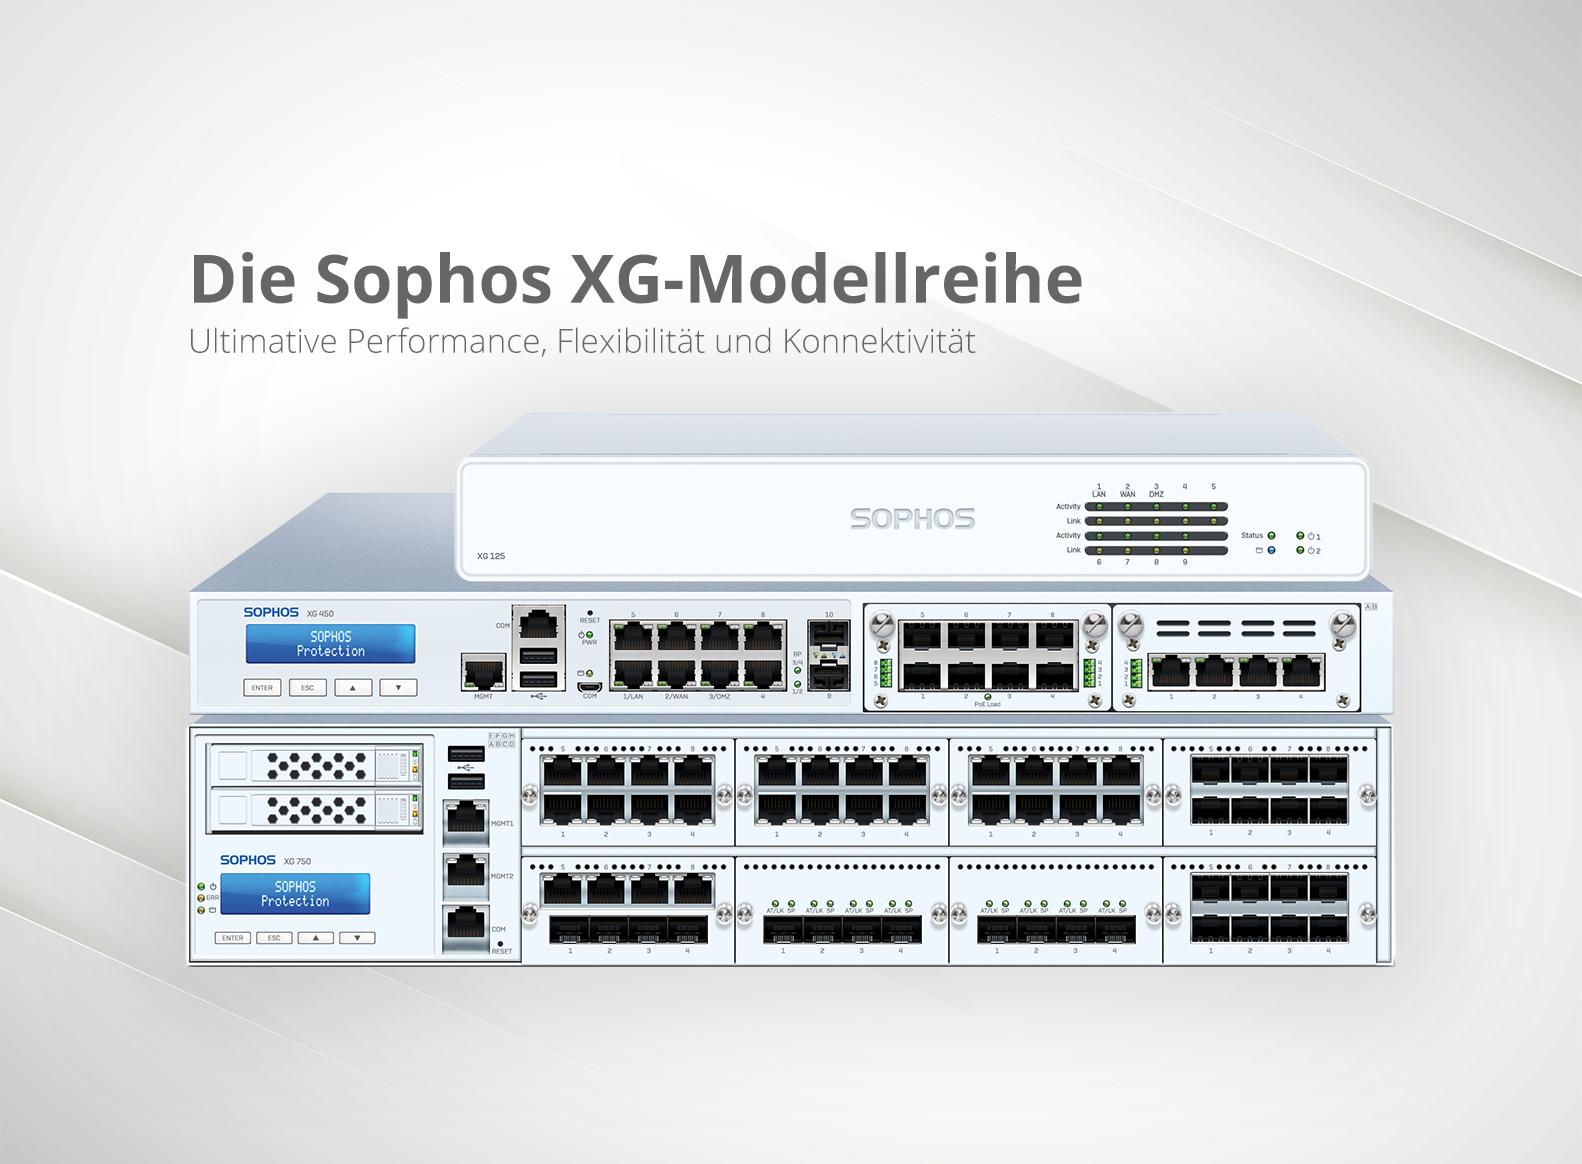 Die Sophos XG-Modellreihe